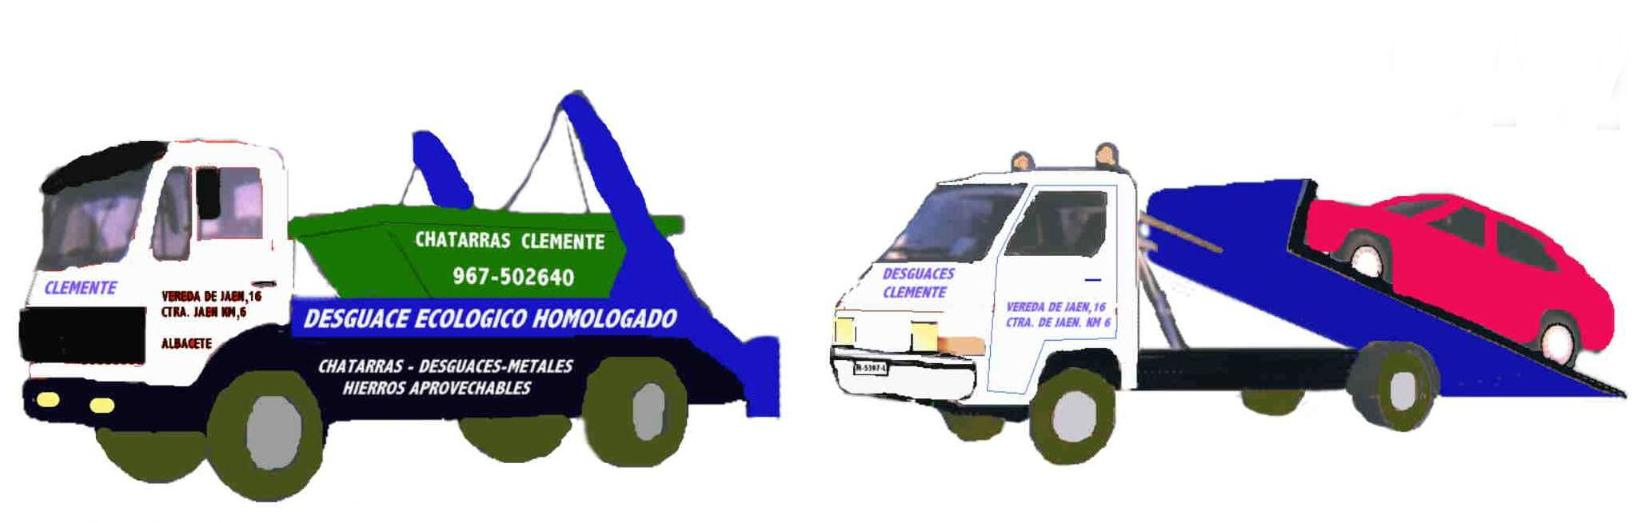 Desguaces Clemente logotipo